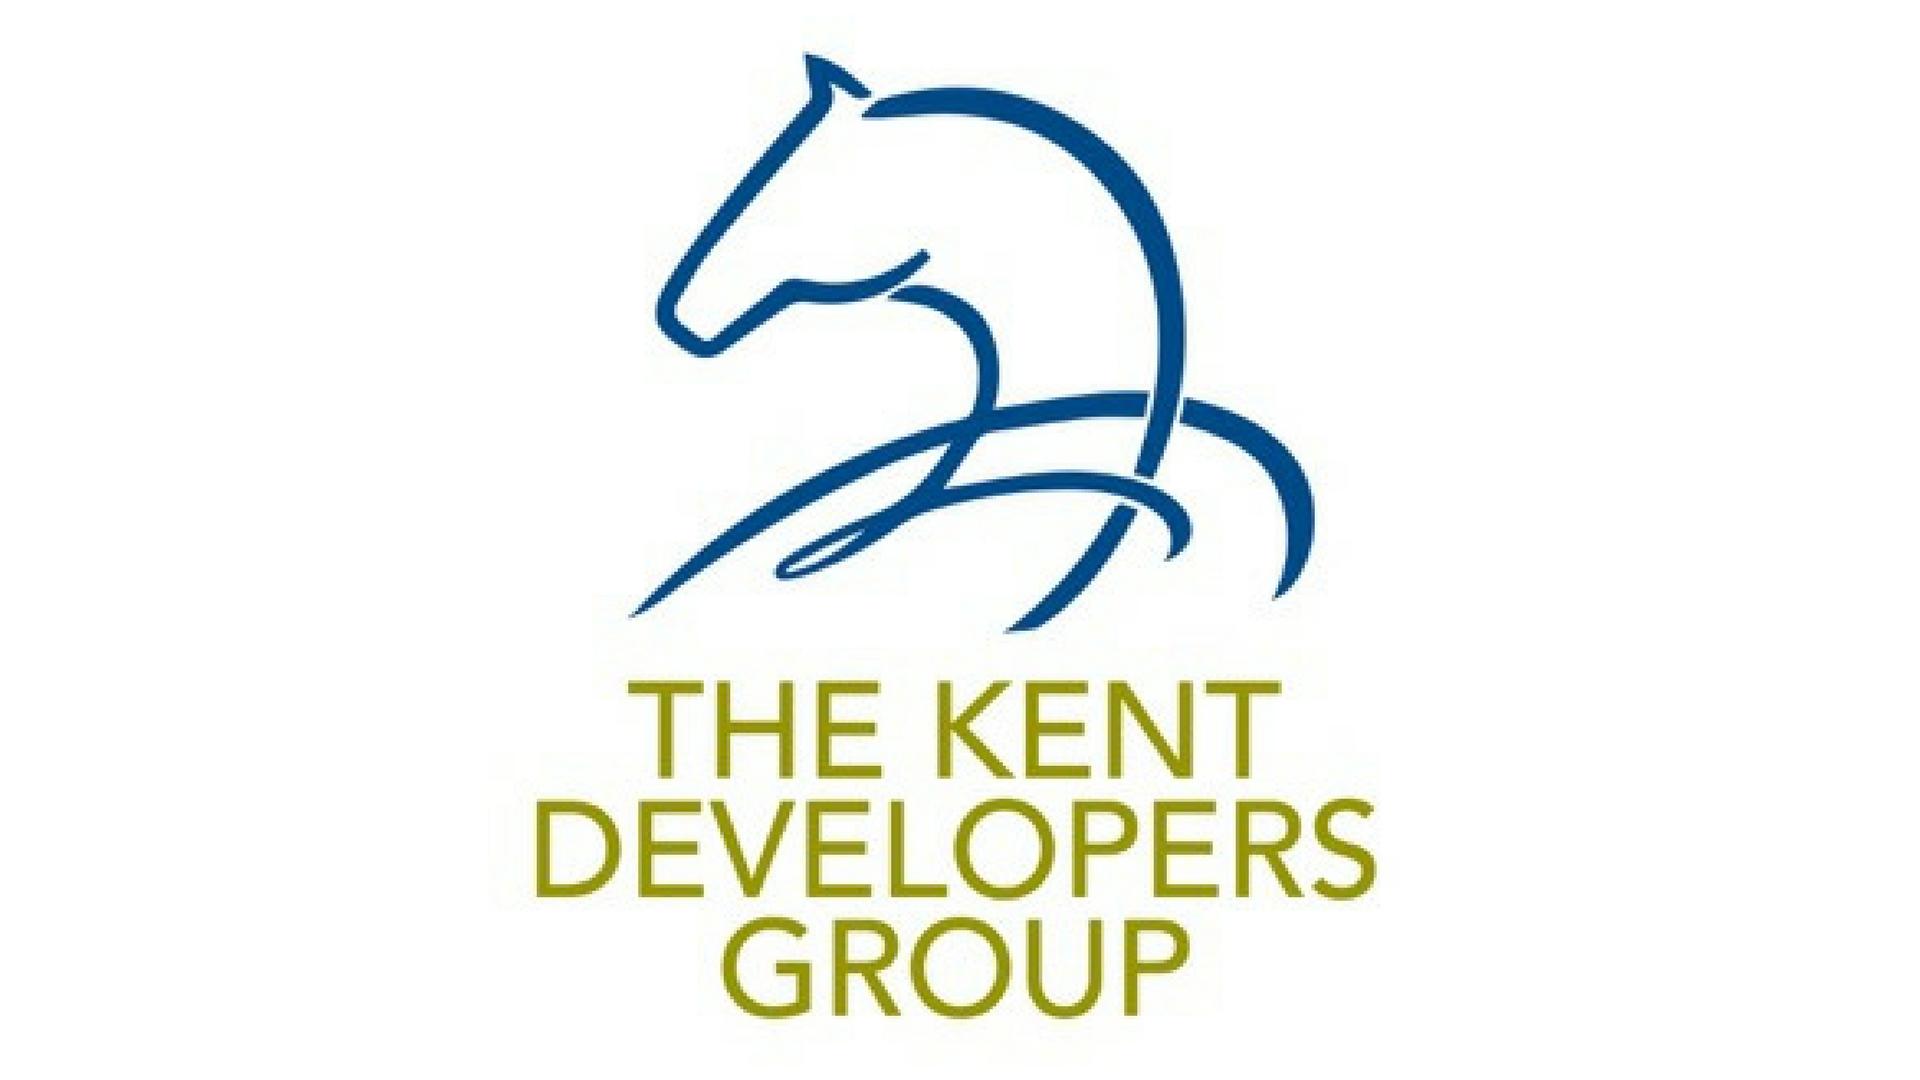 Kent developers group logo